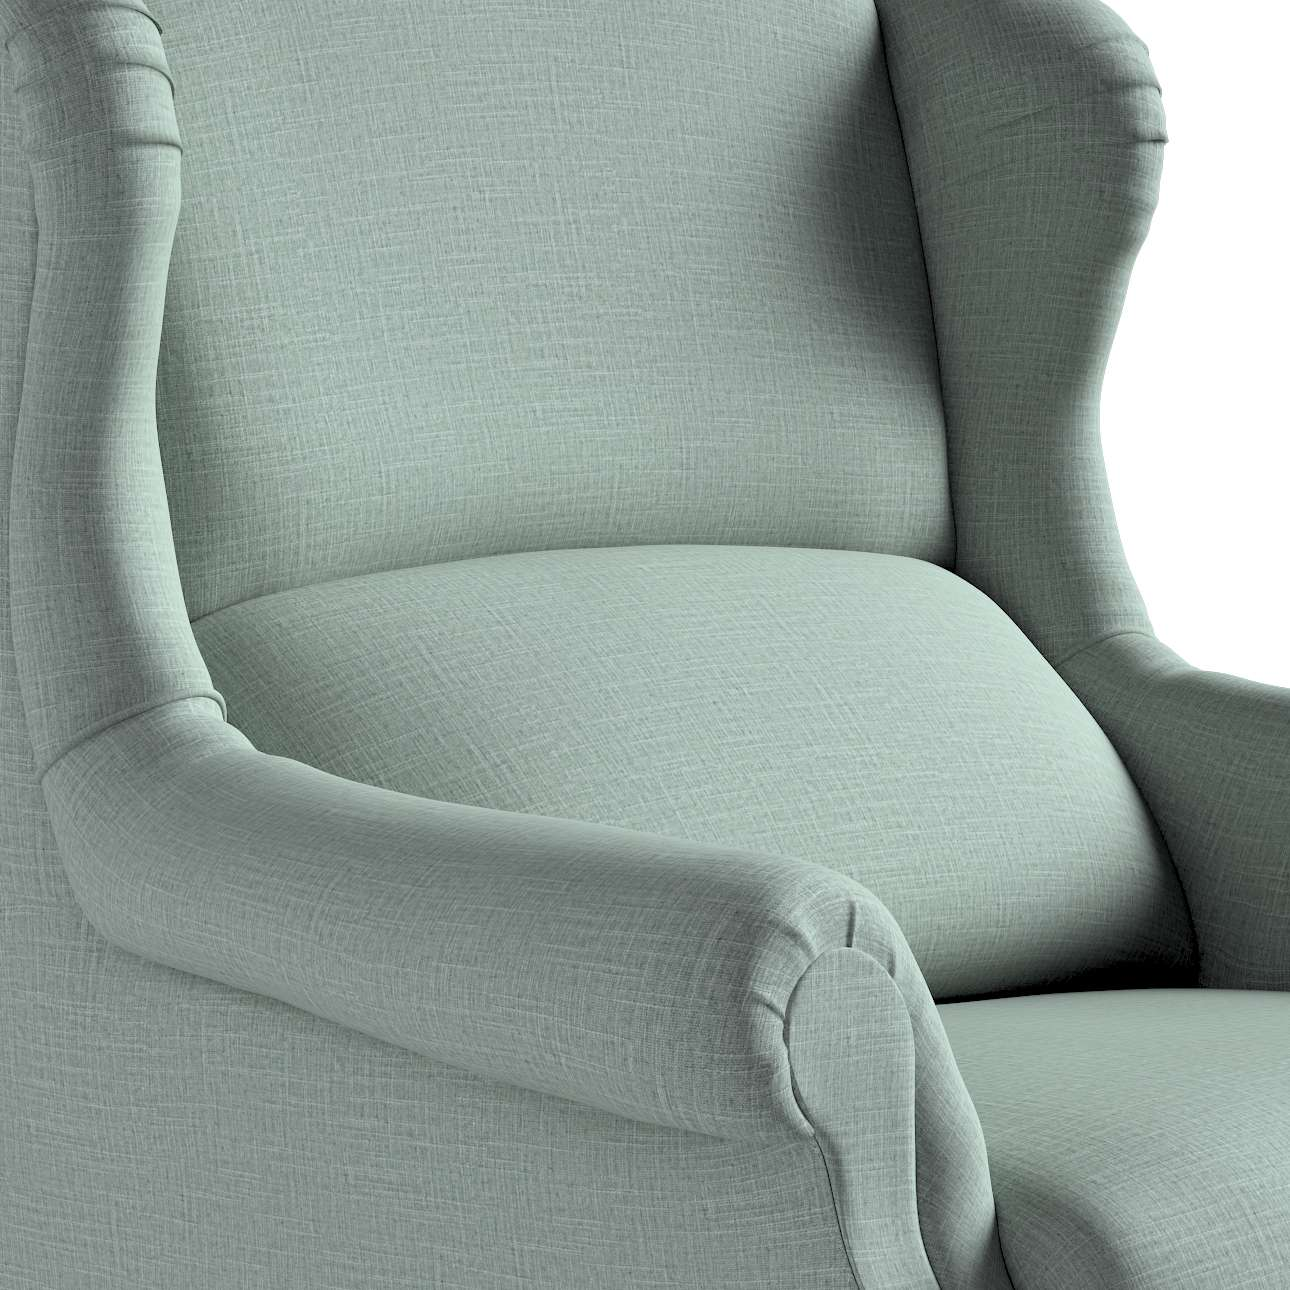 Fotel Unique w kolekcji Living, tkanina: 160-86